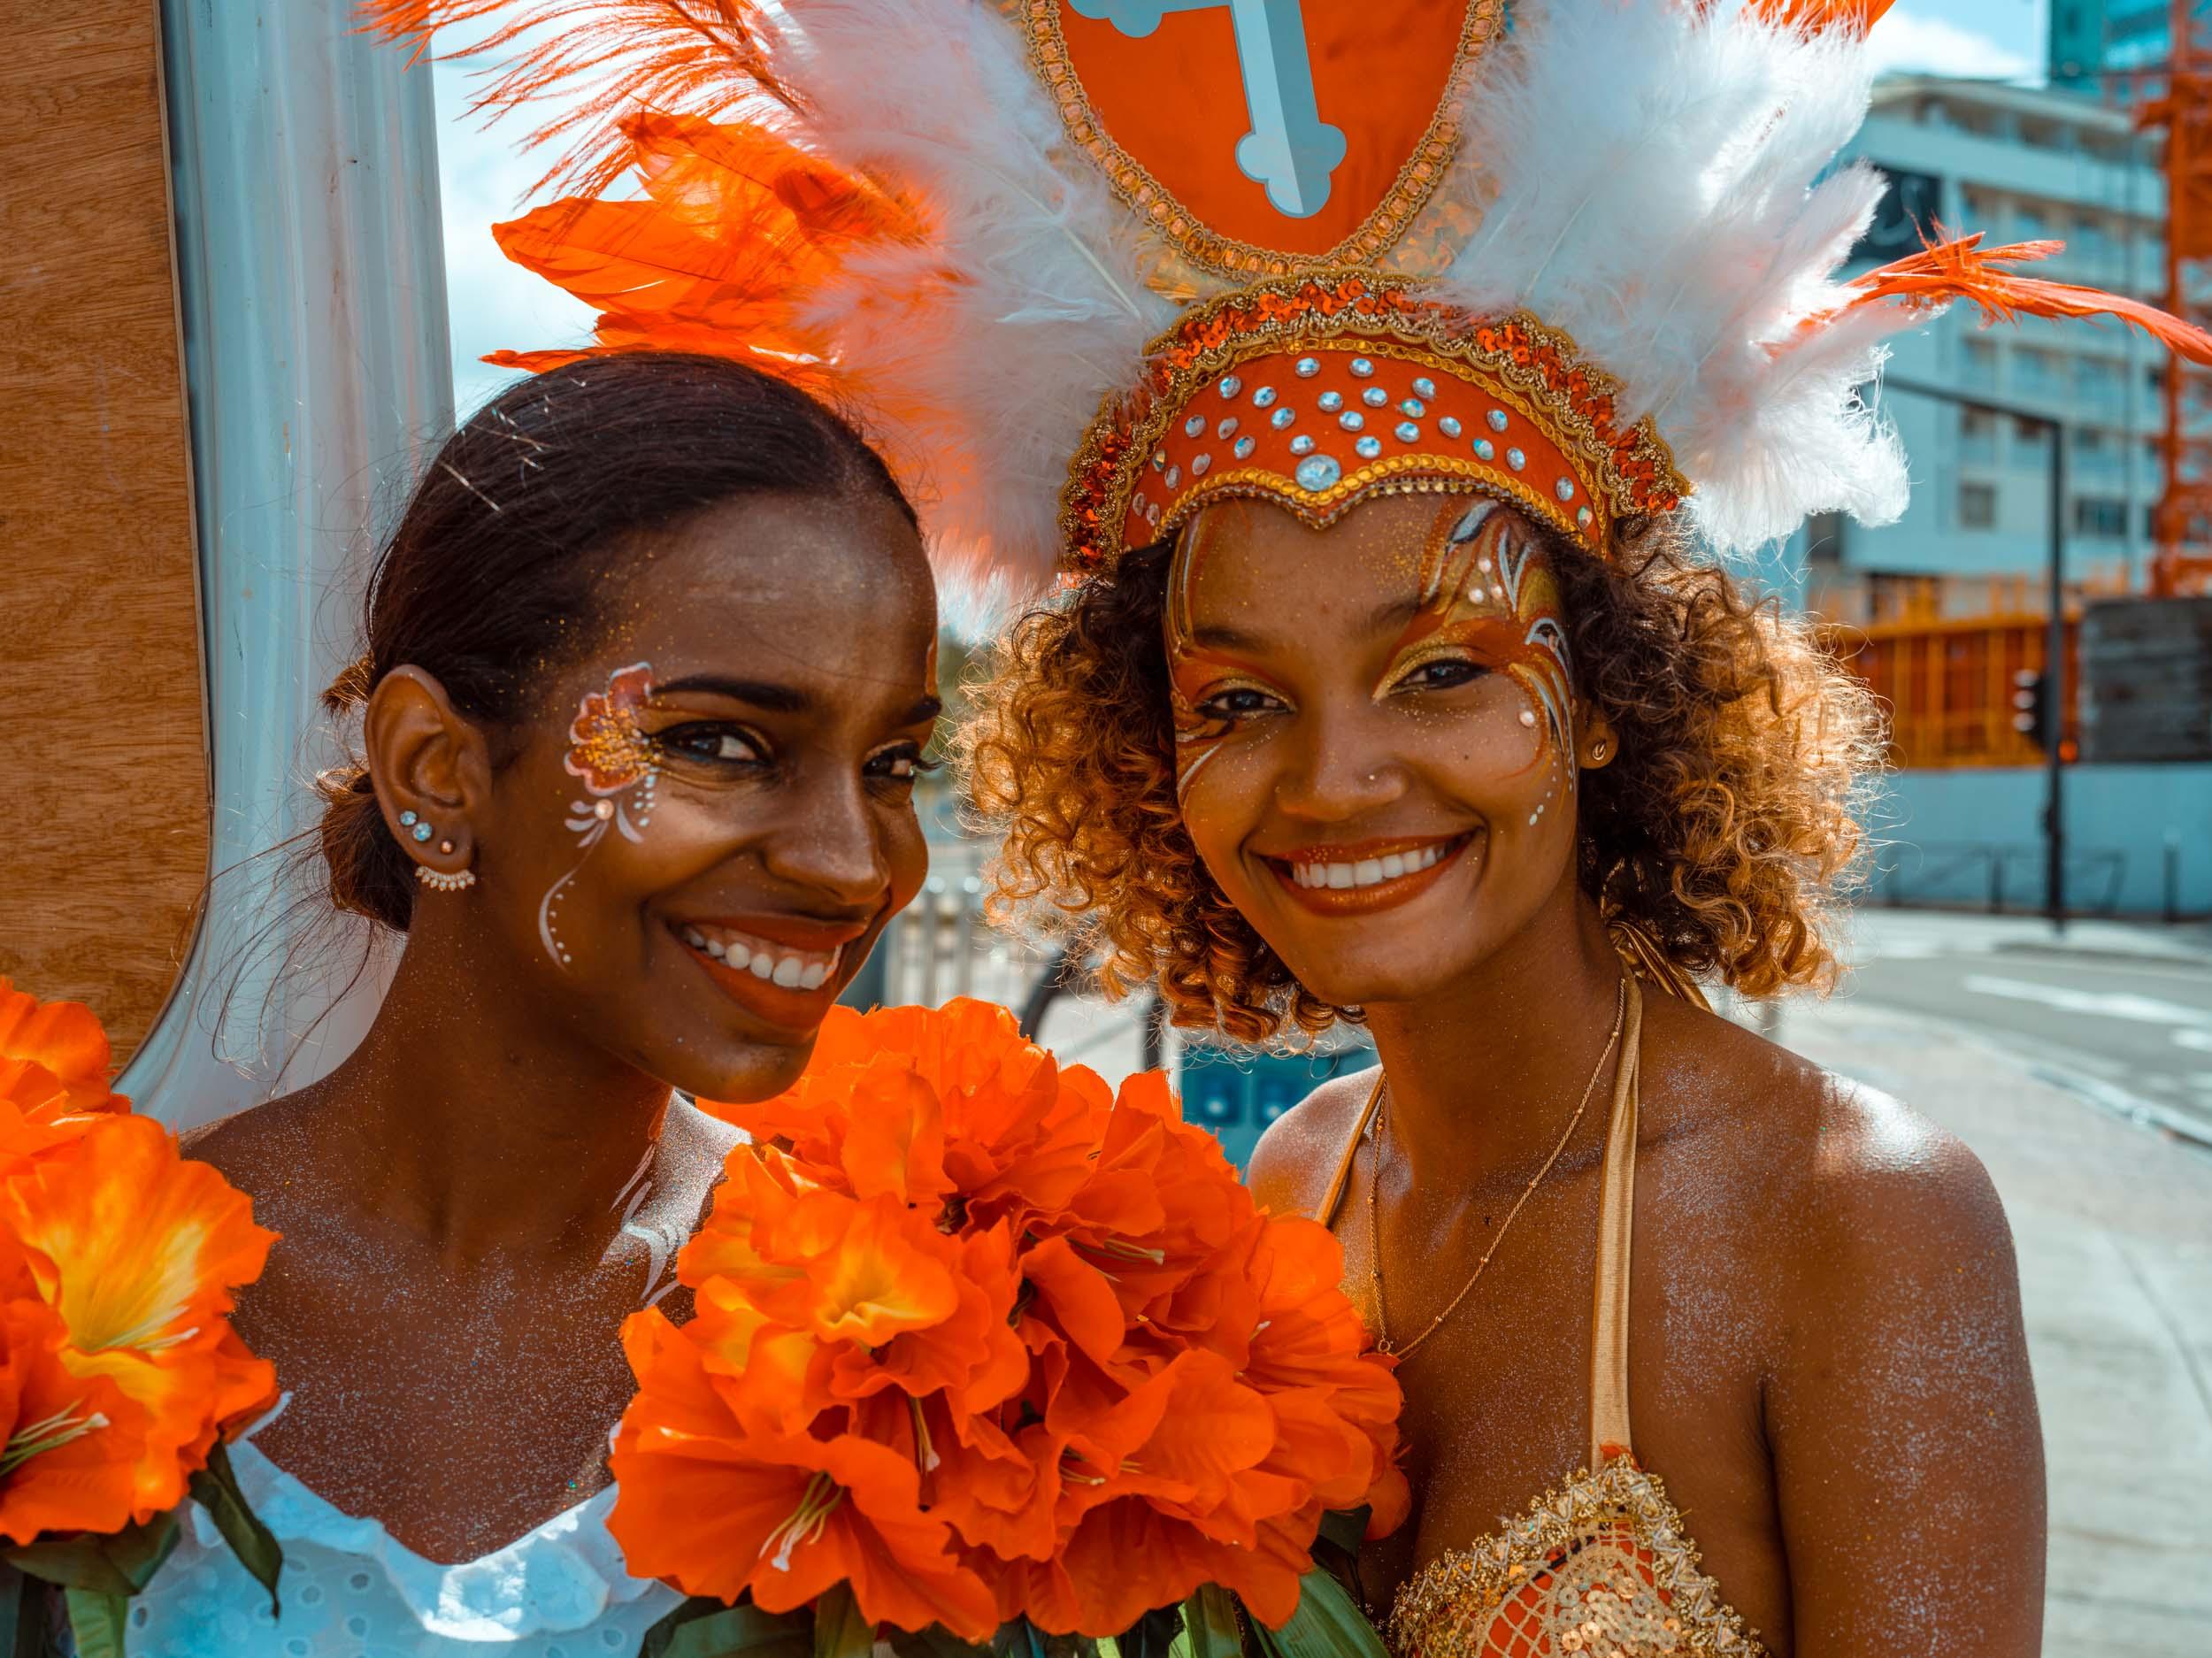 180213_SK_Martinique-3.jpg